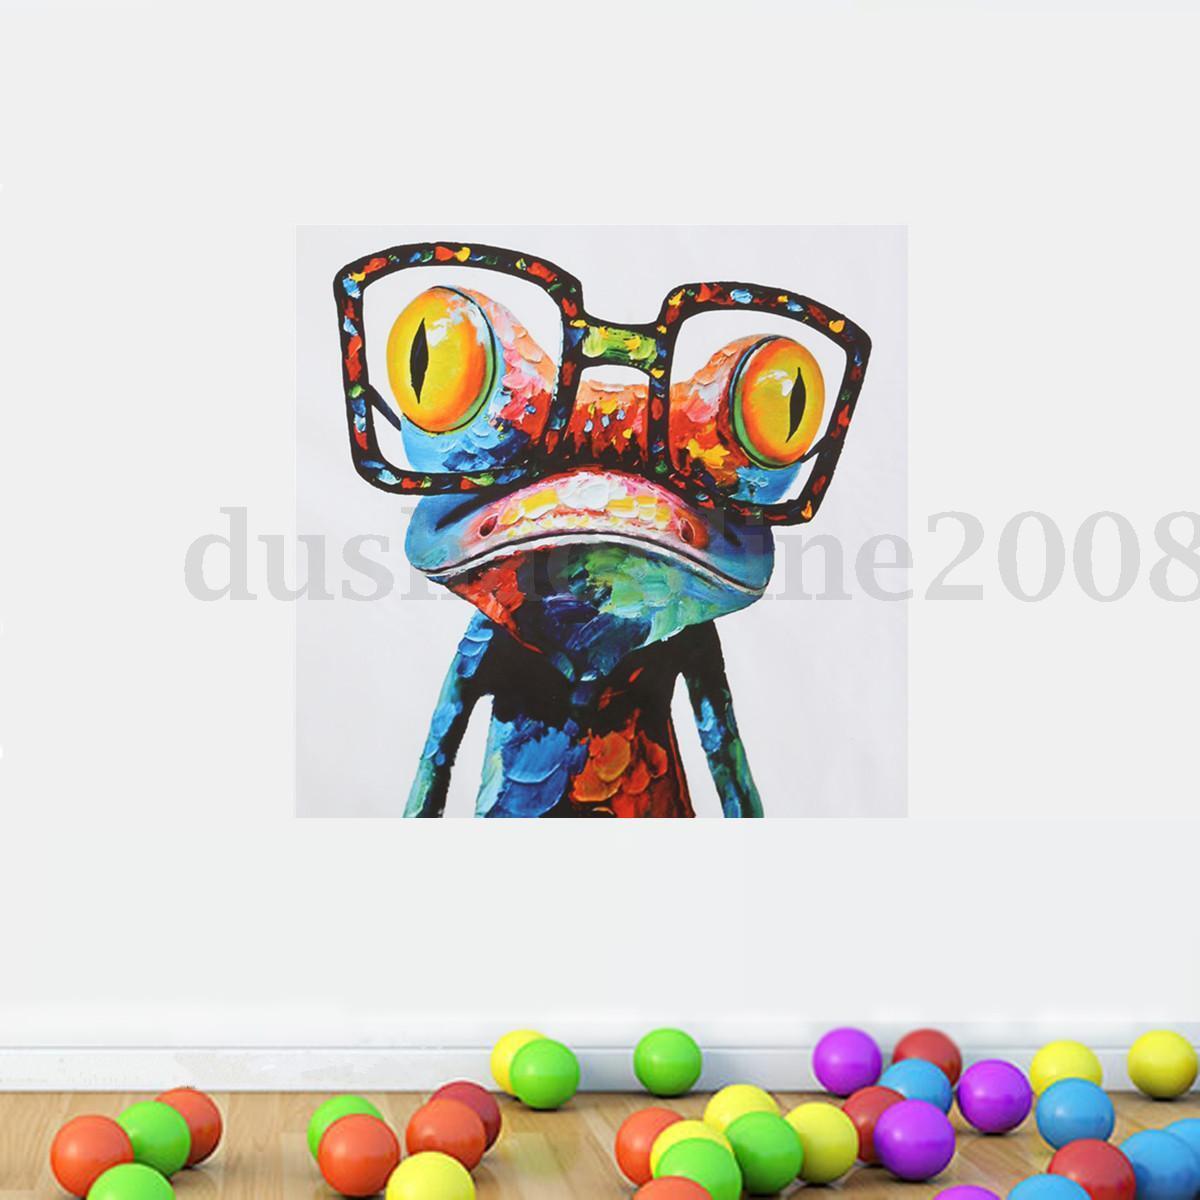 peinture l 39 huile toile tableau abstraite grenouille lunettes art moderne d cor eur 9 99. Black Bedroom Furniture Sets. Home Design Ideas